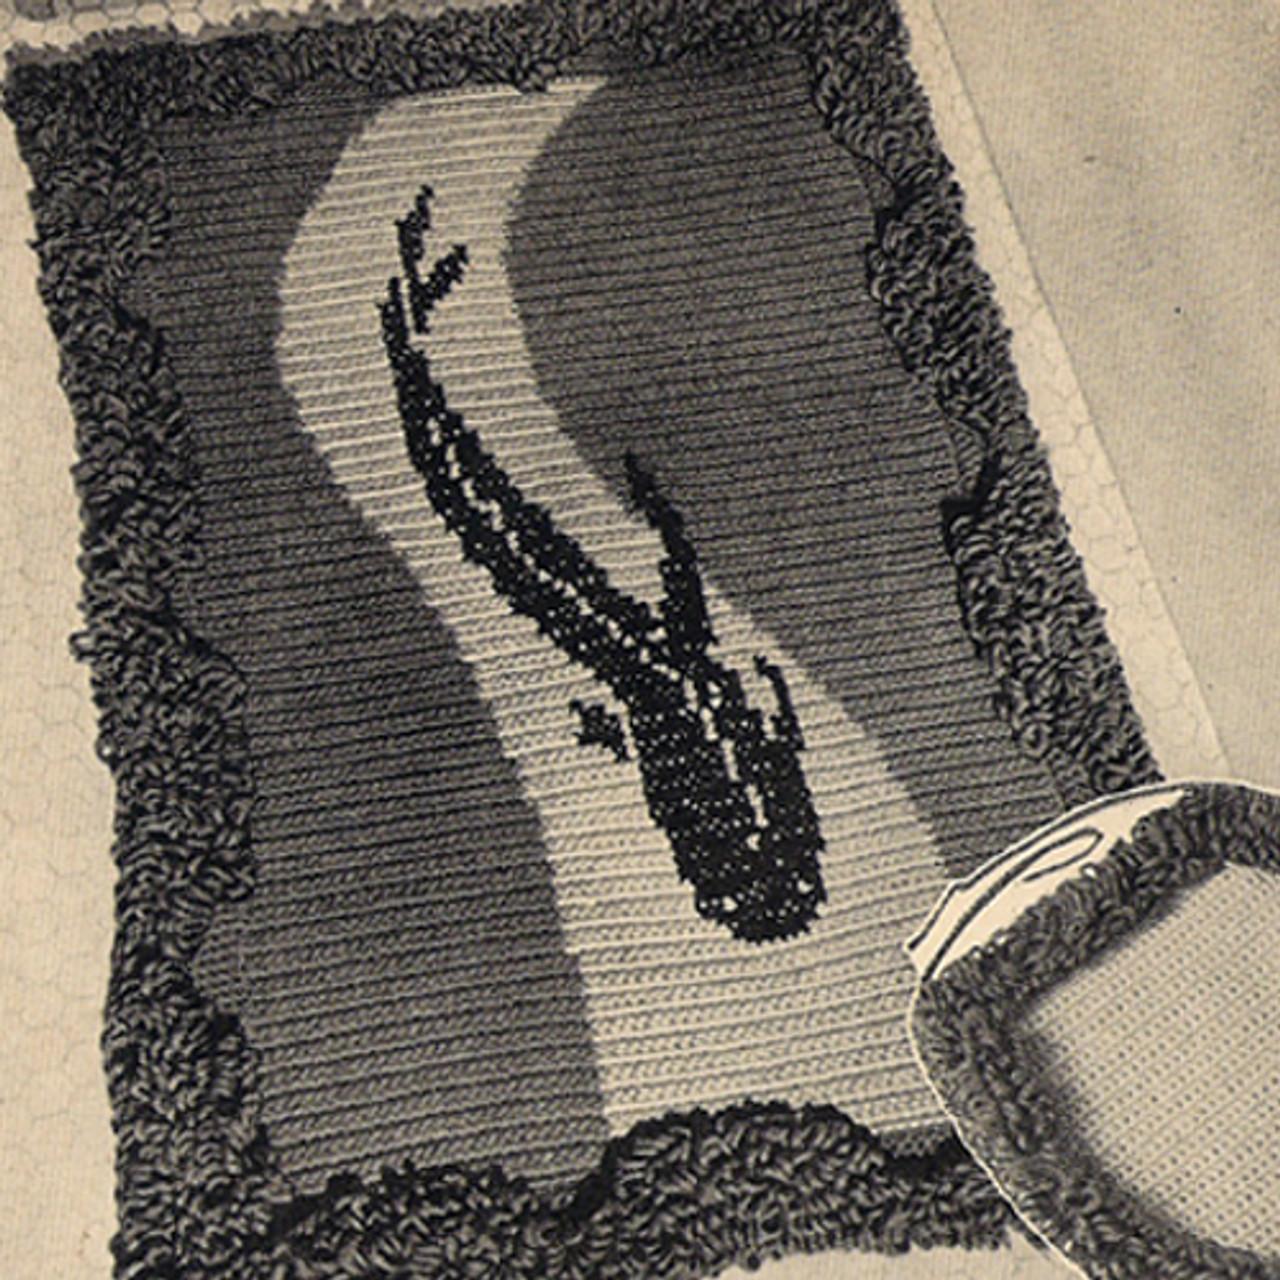 Crocheted Marine Rug Pattern with Fringed Border